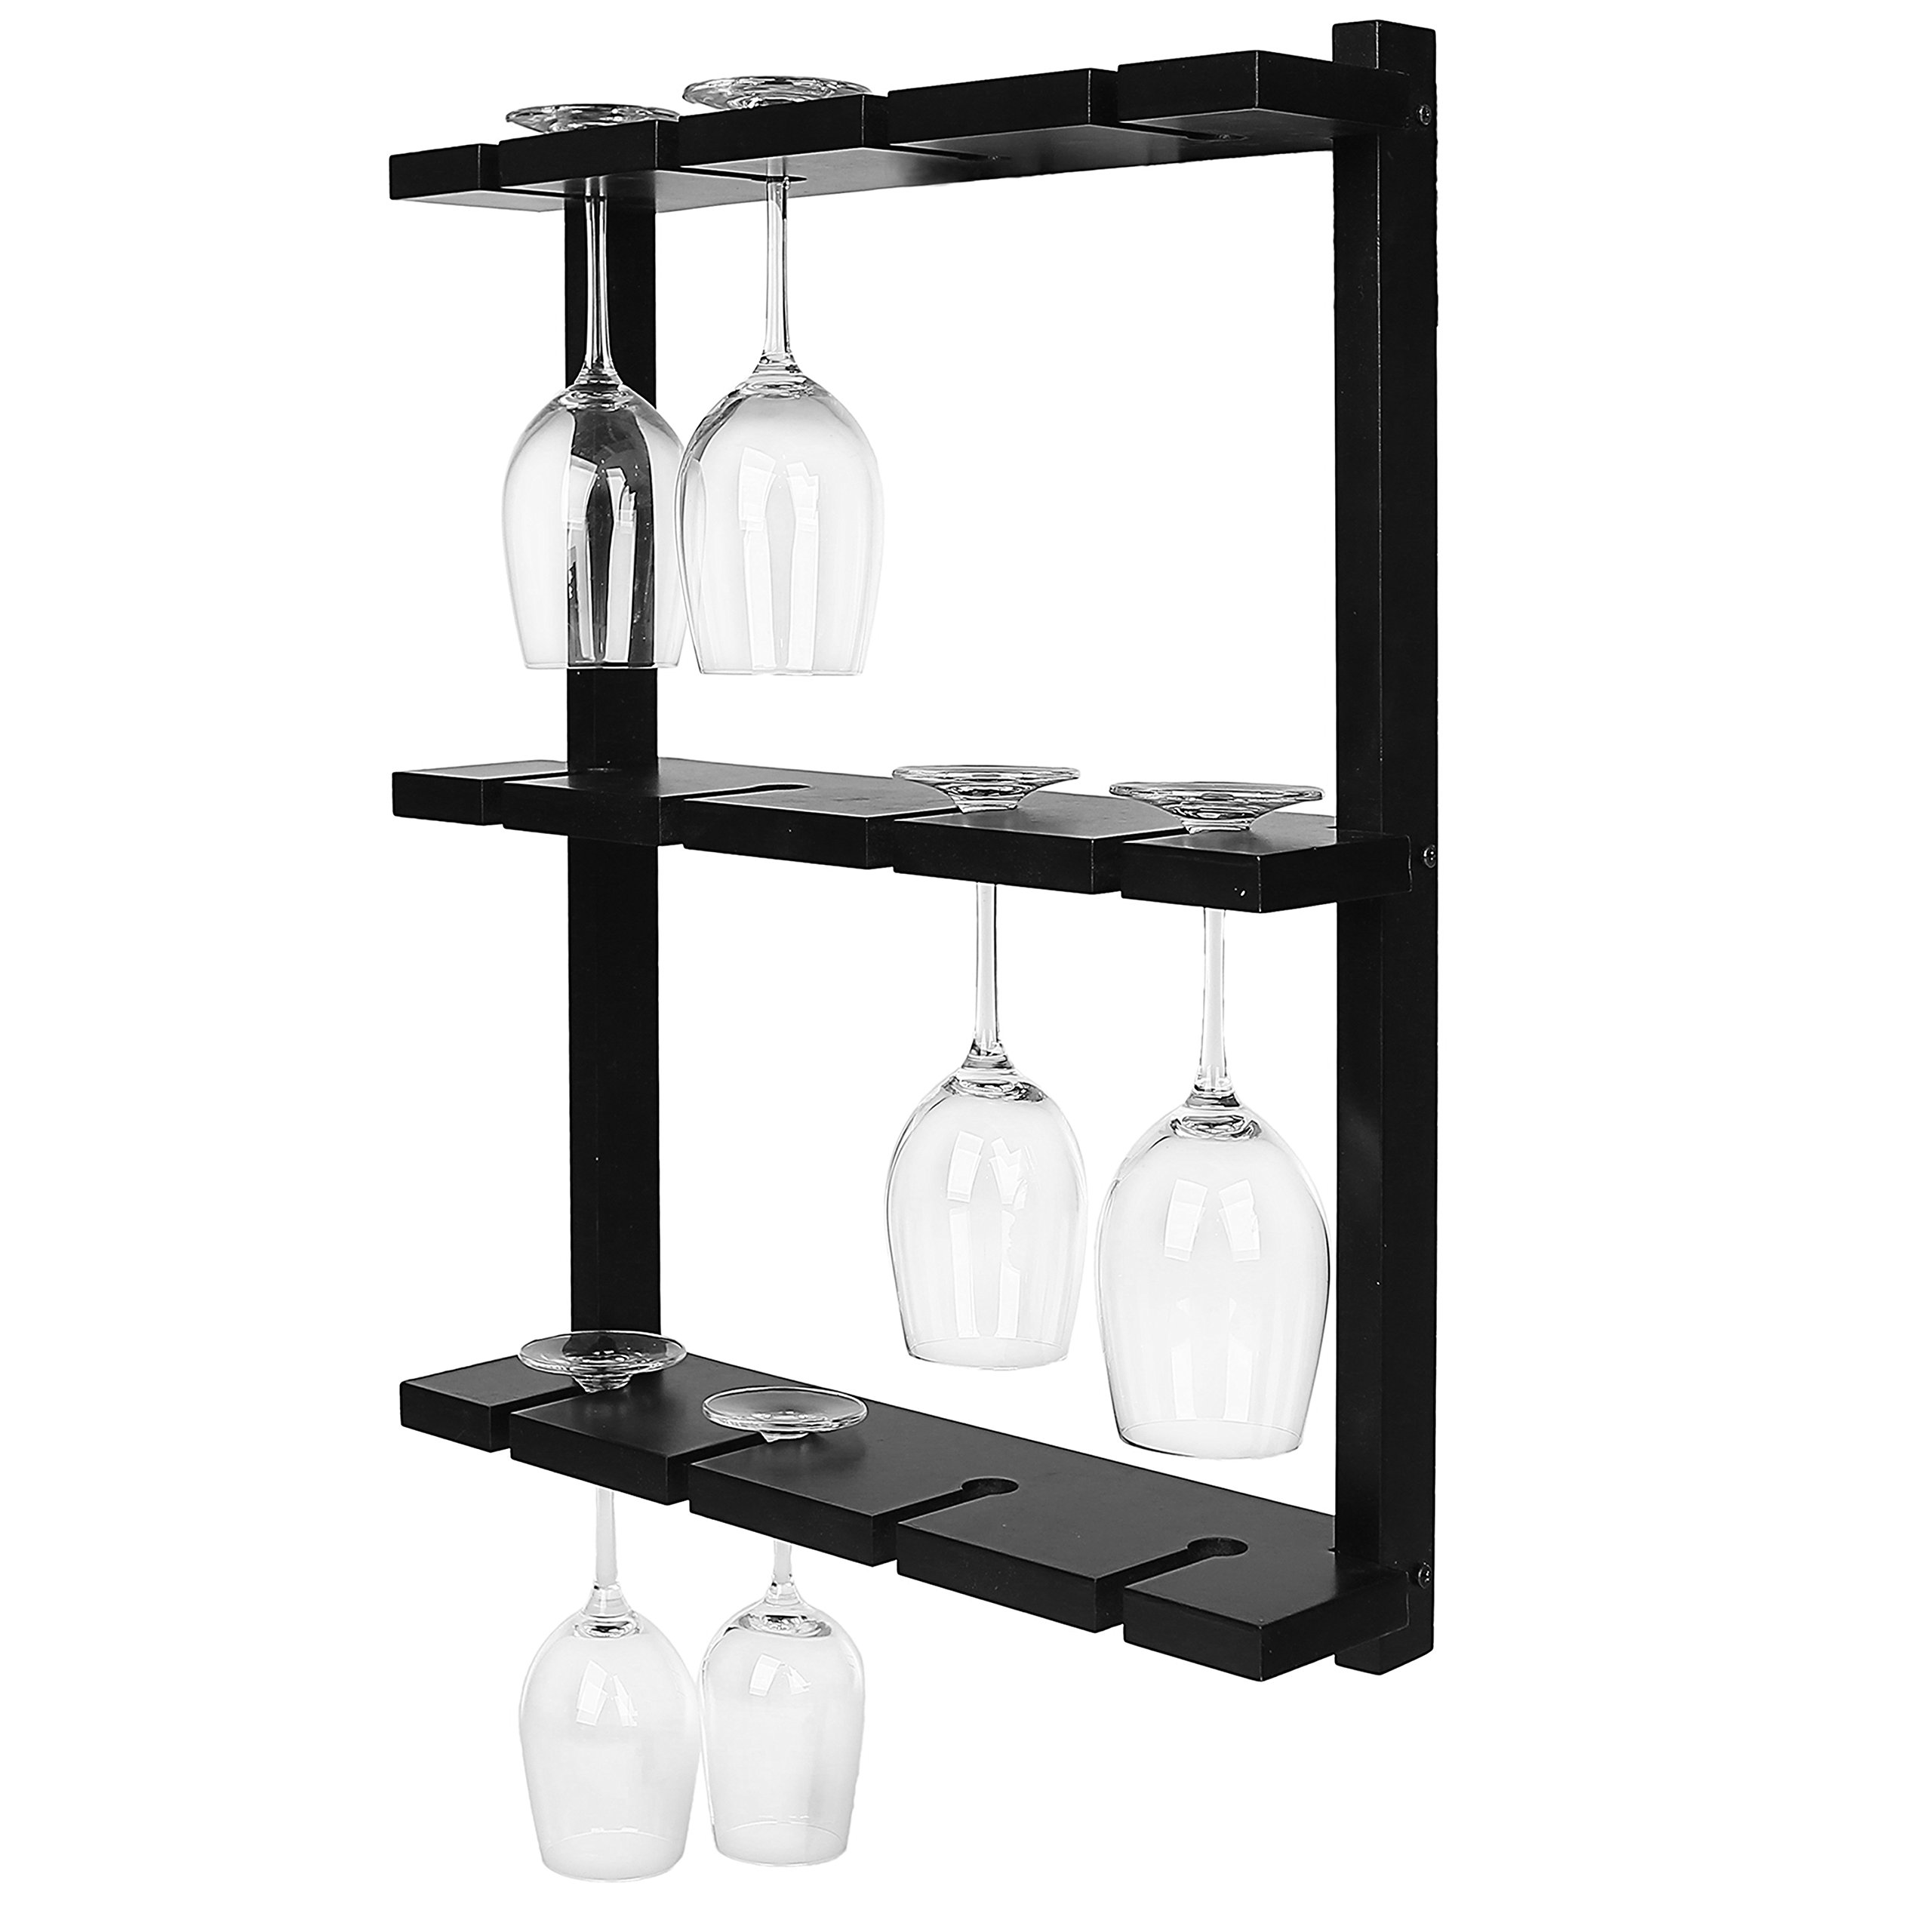 MyGift Black Wood Wall-Mounted 12 Wine Glass Holder Rack, Inverted Stemware Display